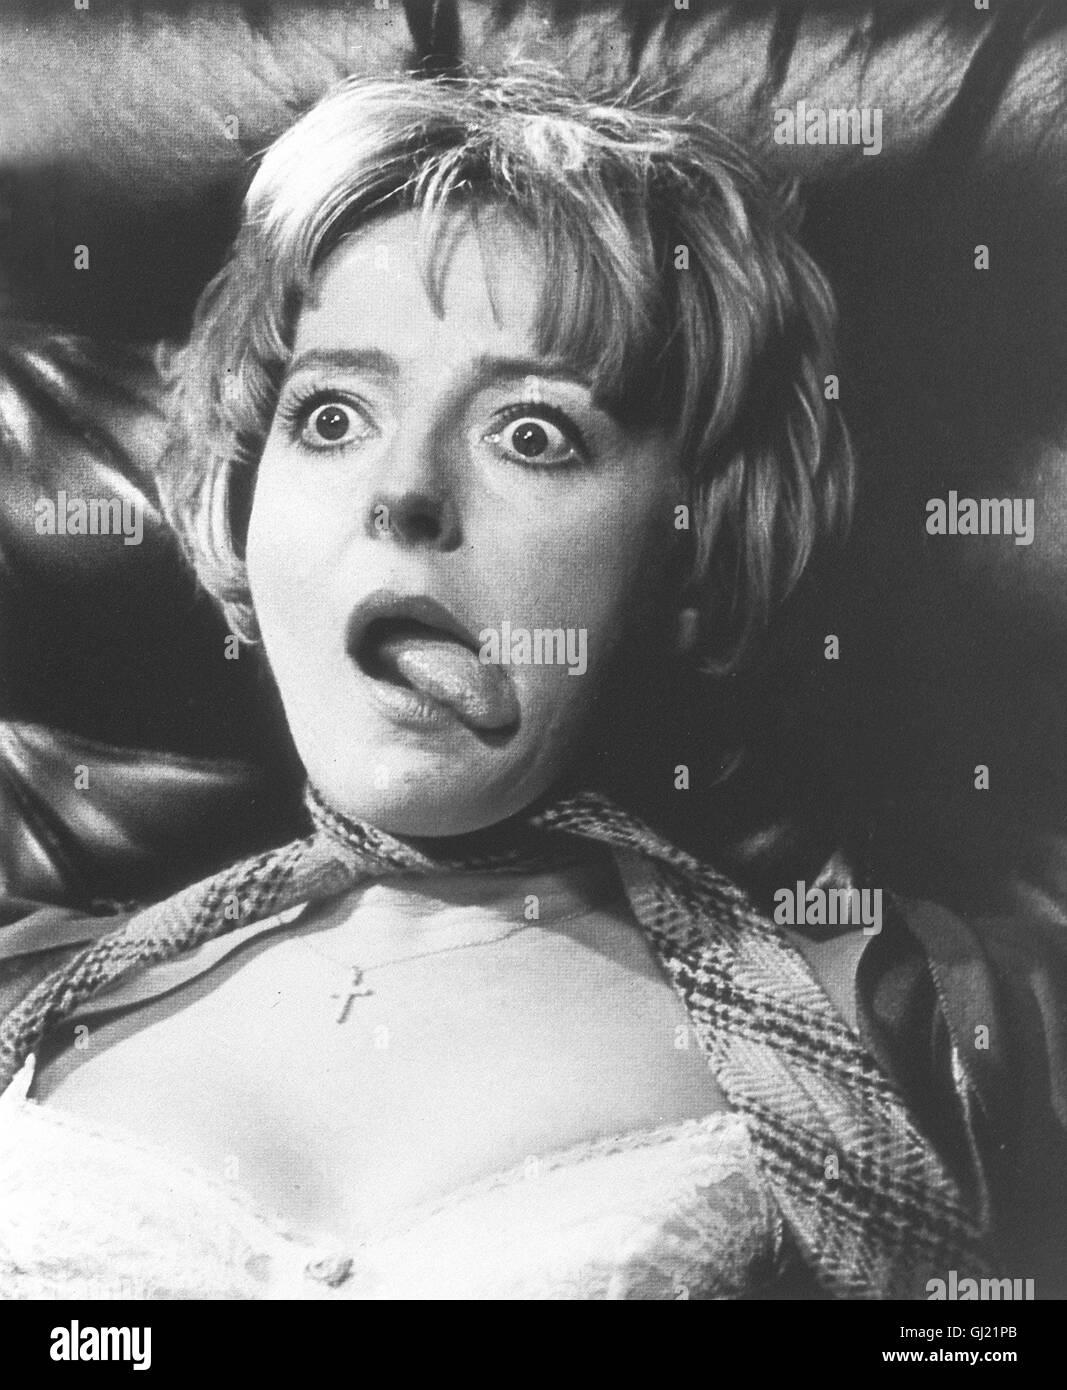 Catherine Oxenberg born September 22, 1961 (age 57),Fanny Mallette Porno clip Nikki Dial,Eva Tamargo